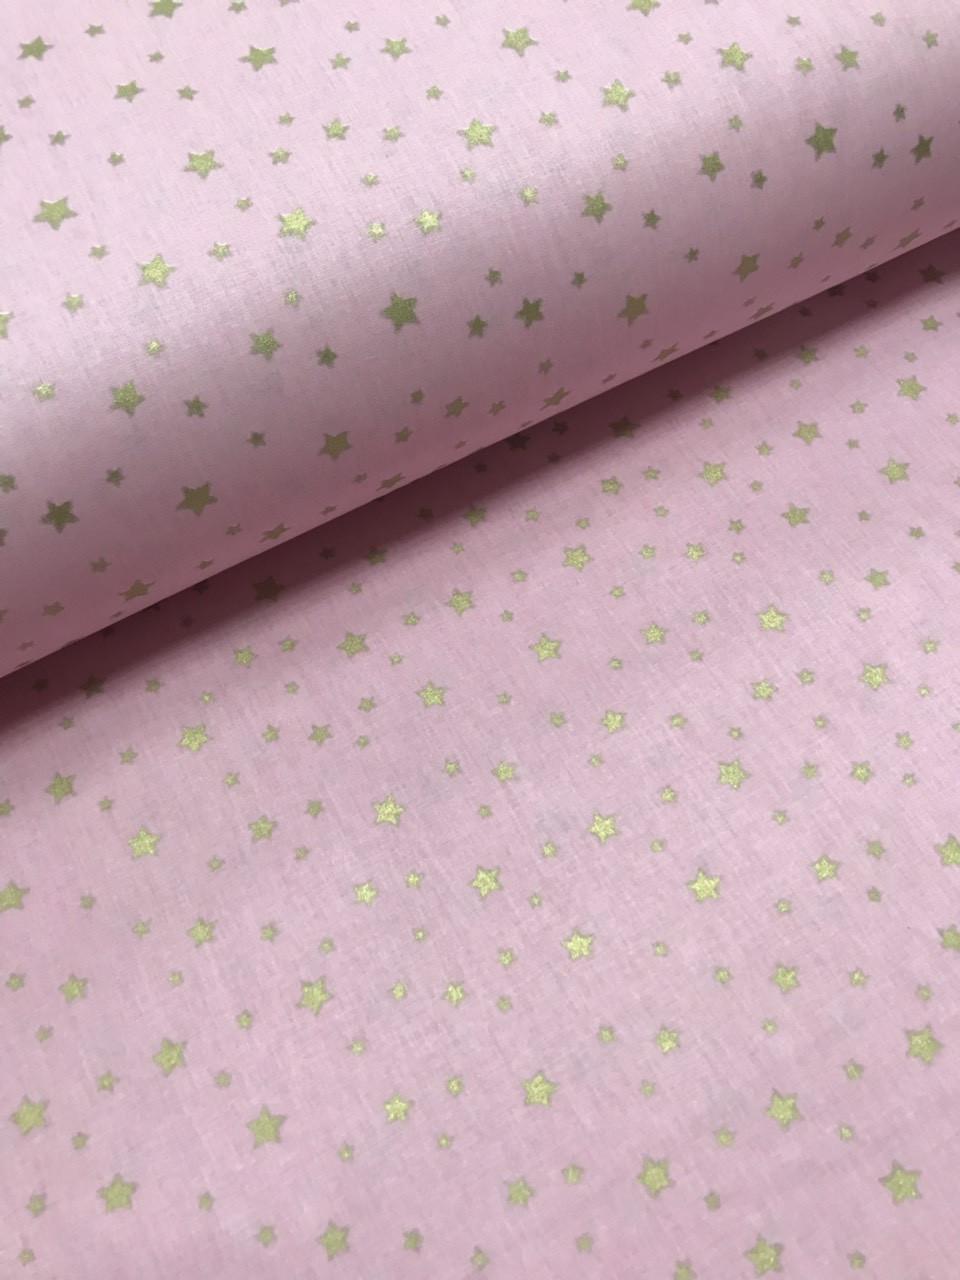 Ткань поплин золотистый  звездопад (глиттер) на розовом (ТУРЦИЯ шир. 2,4 м) №32-182 ОТРЕЗ(0,8*2,4м)